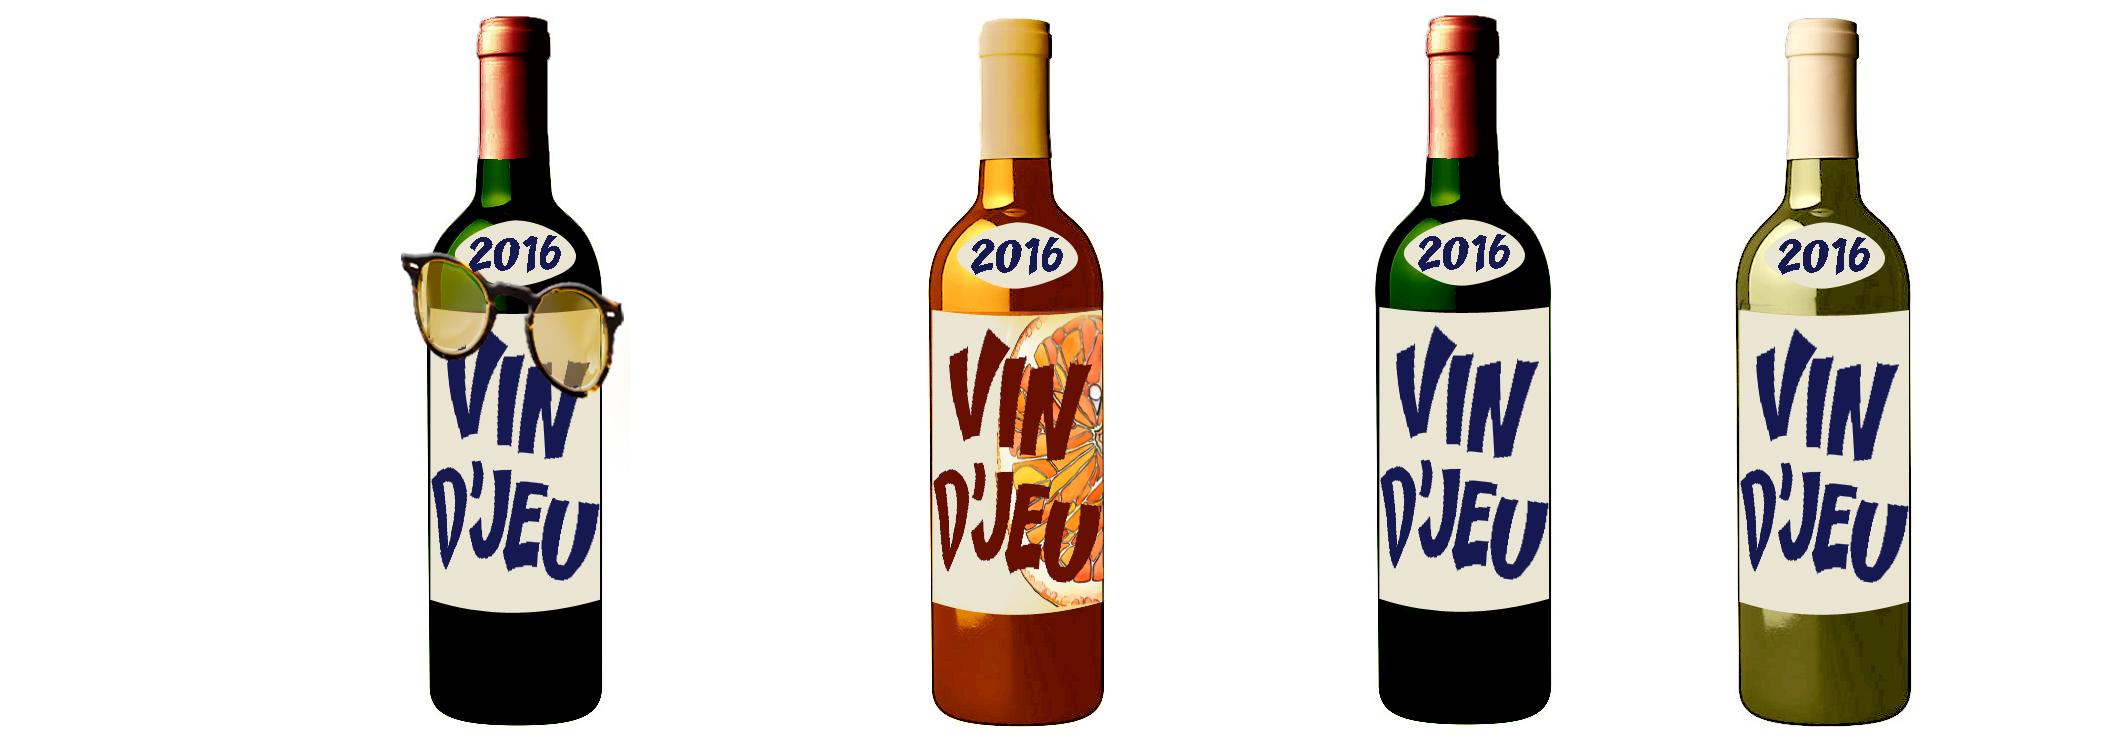 4-bouteilles-vin-djeu-2016